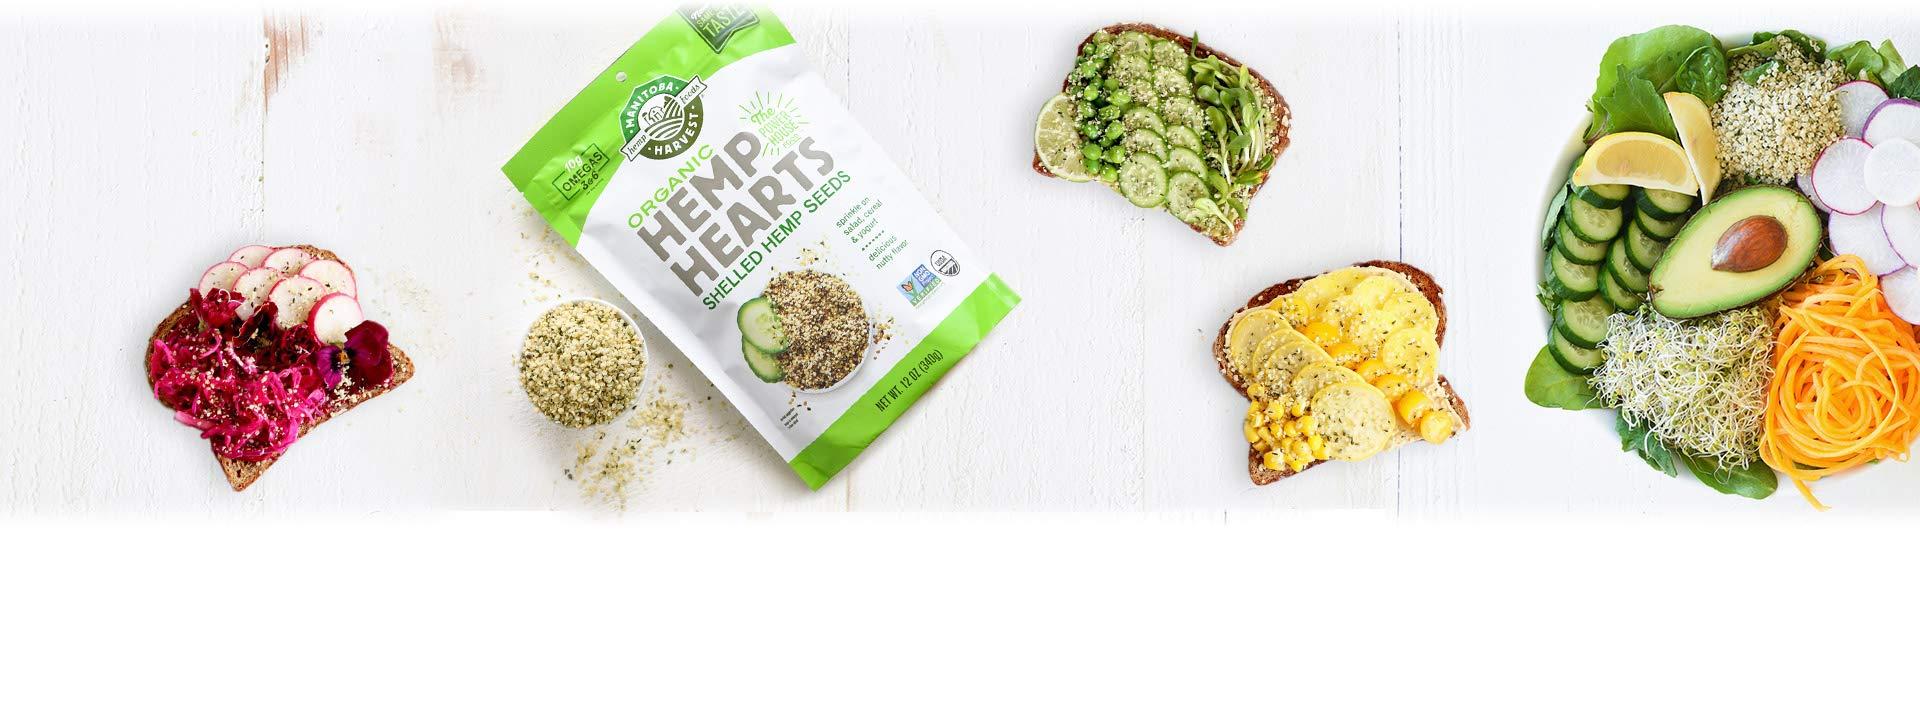 Manitoba Harvest Organic Hemp Hearts Raw Shelled Hemp Seeds, 12oz; with 10g Protein & Omegas per Serving, Non-GMO, Gluten Free by Manitoba Harvest (Image #3)